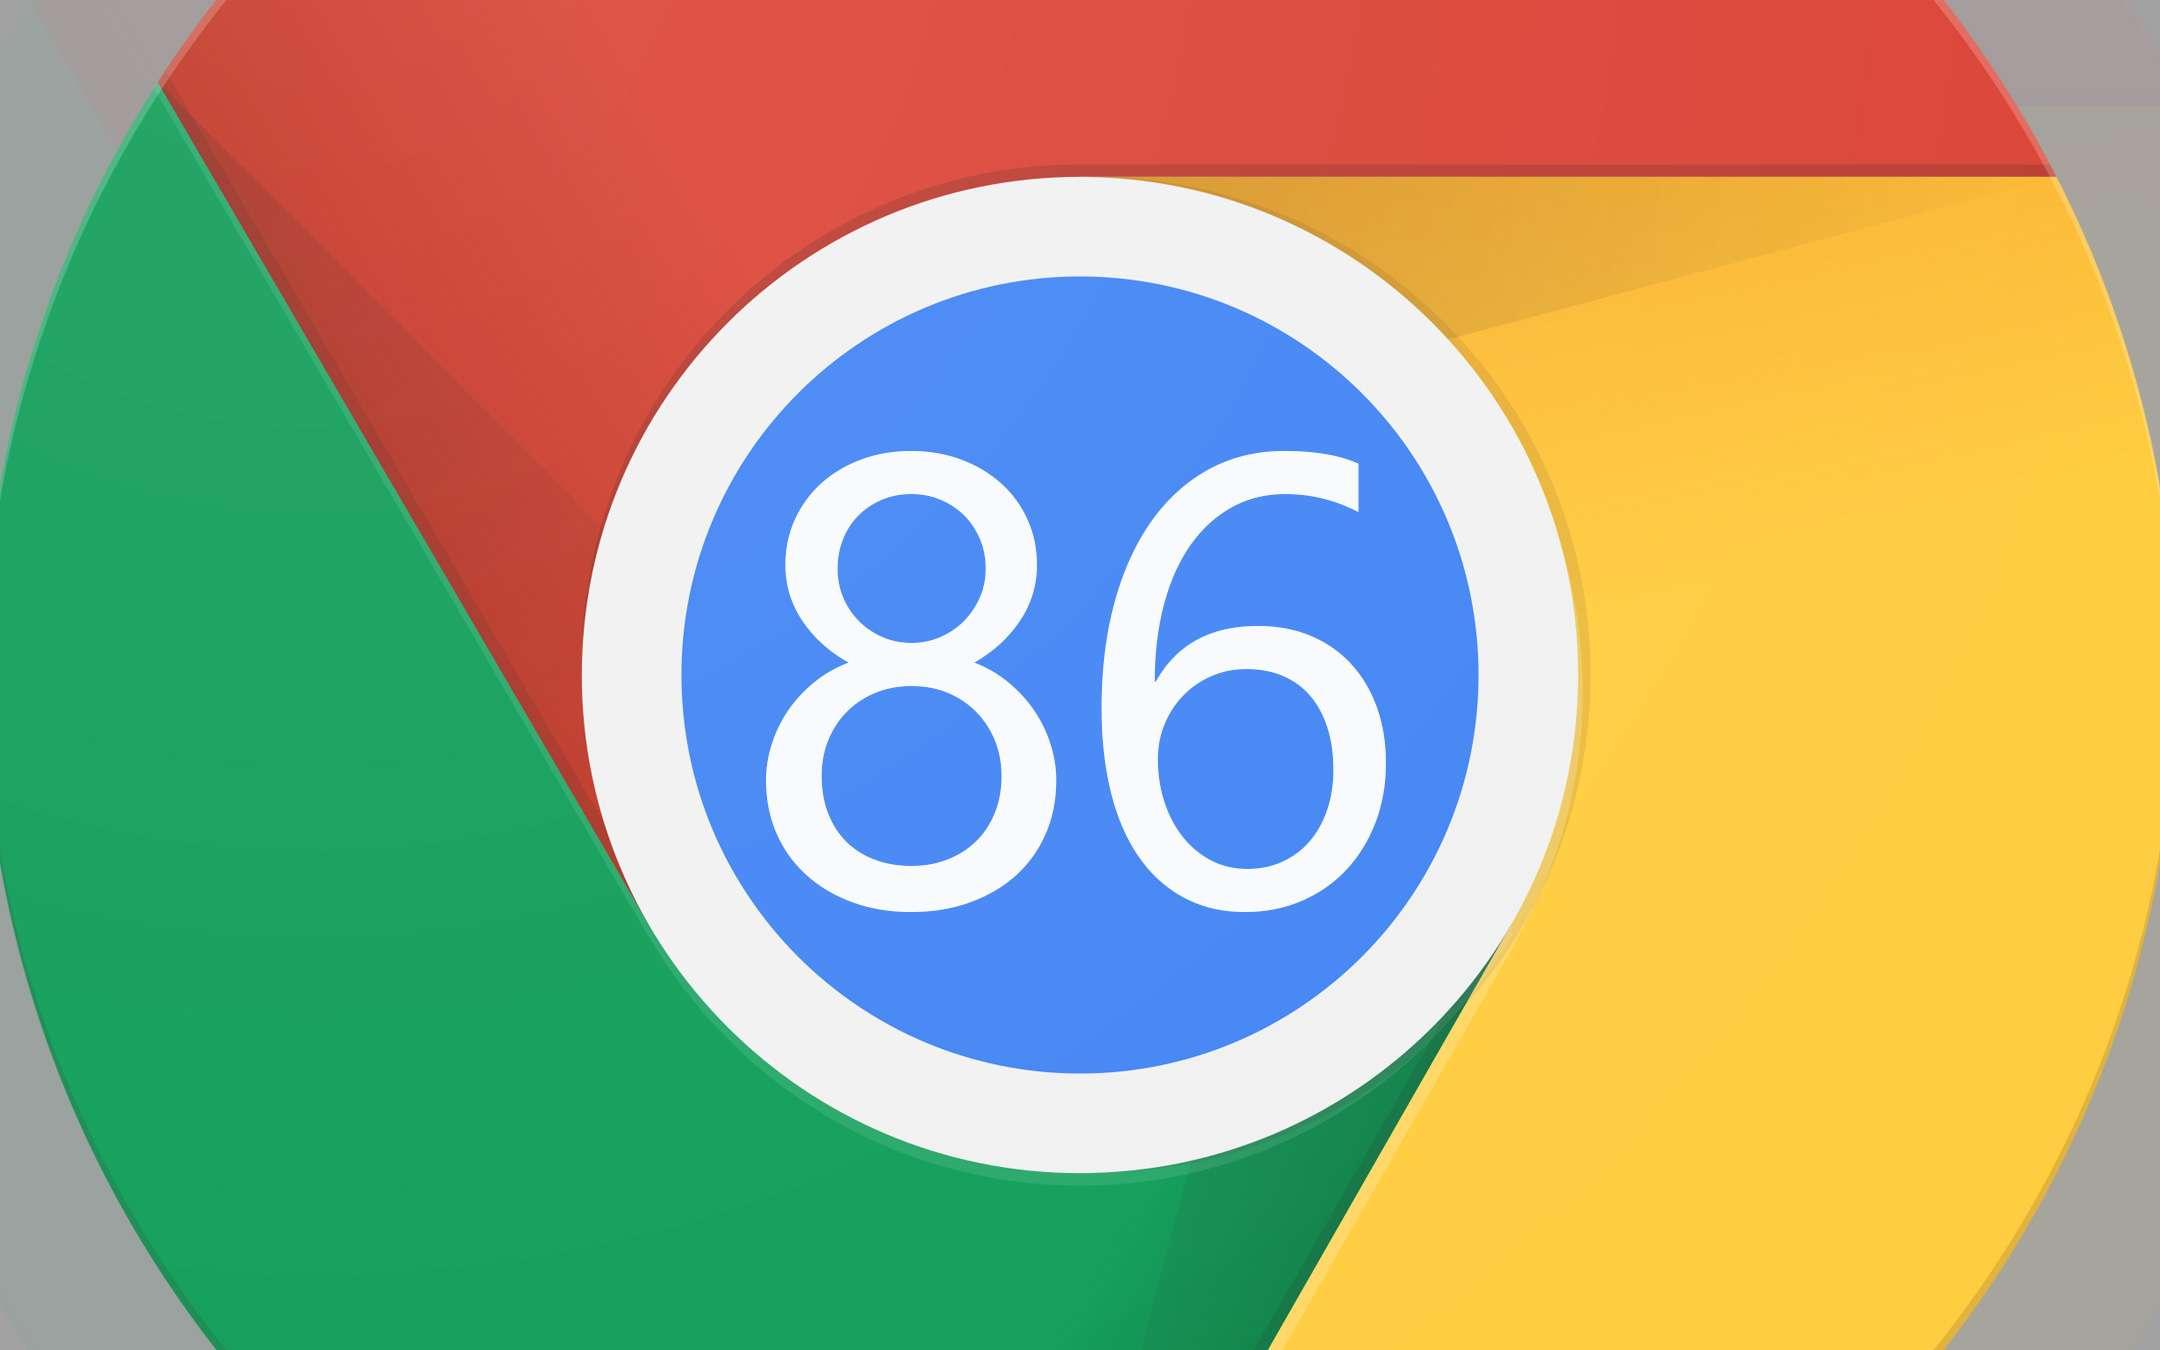 Chrome 86: new update to close vulnerabilities